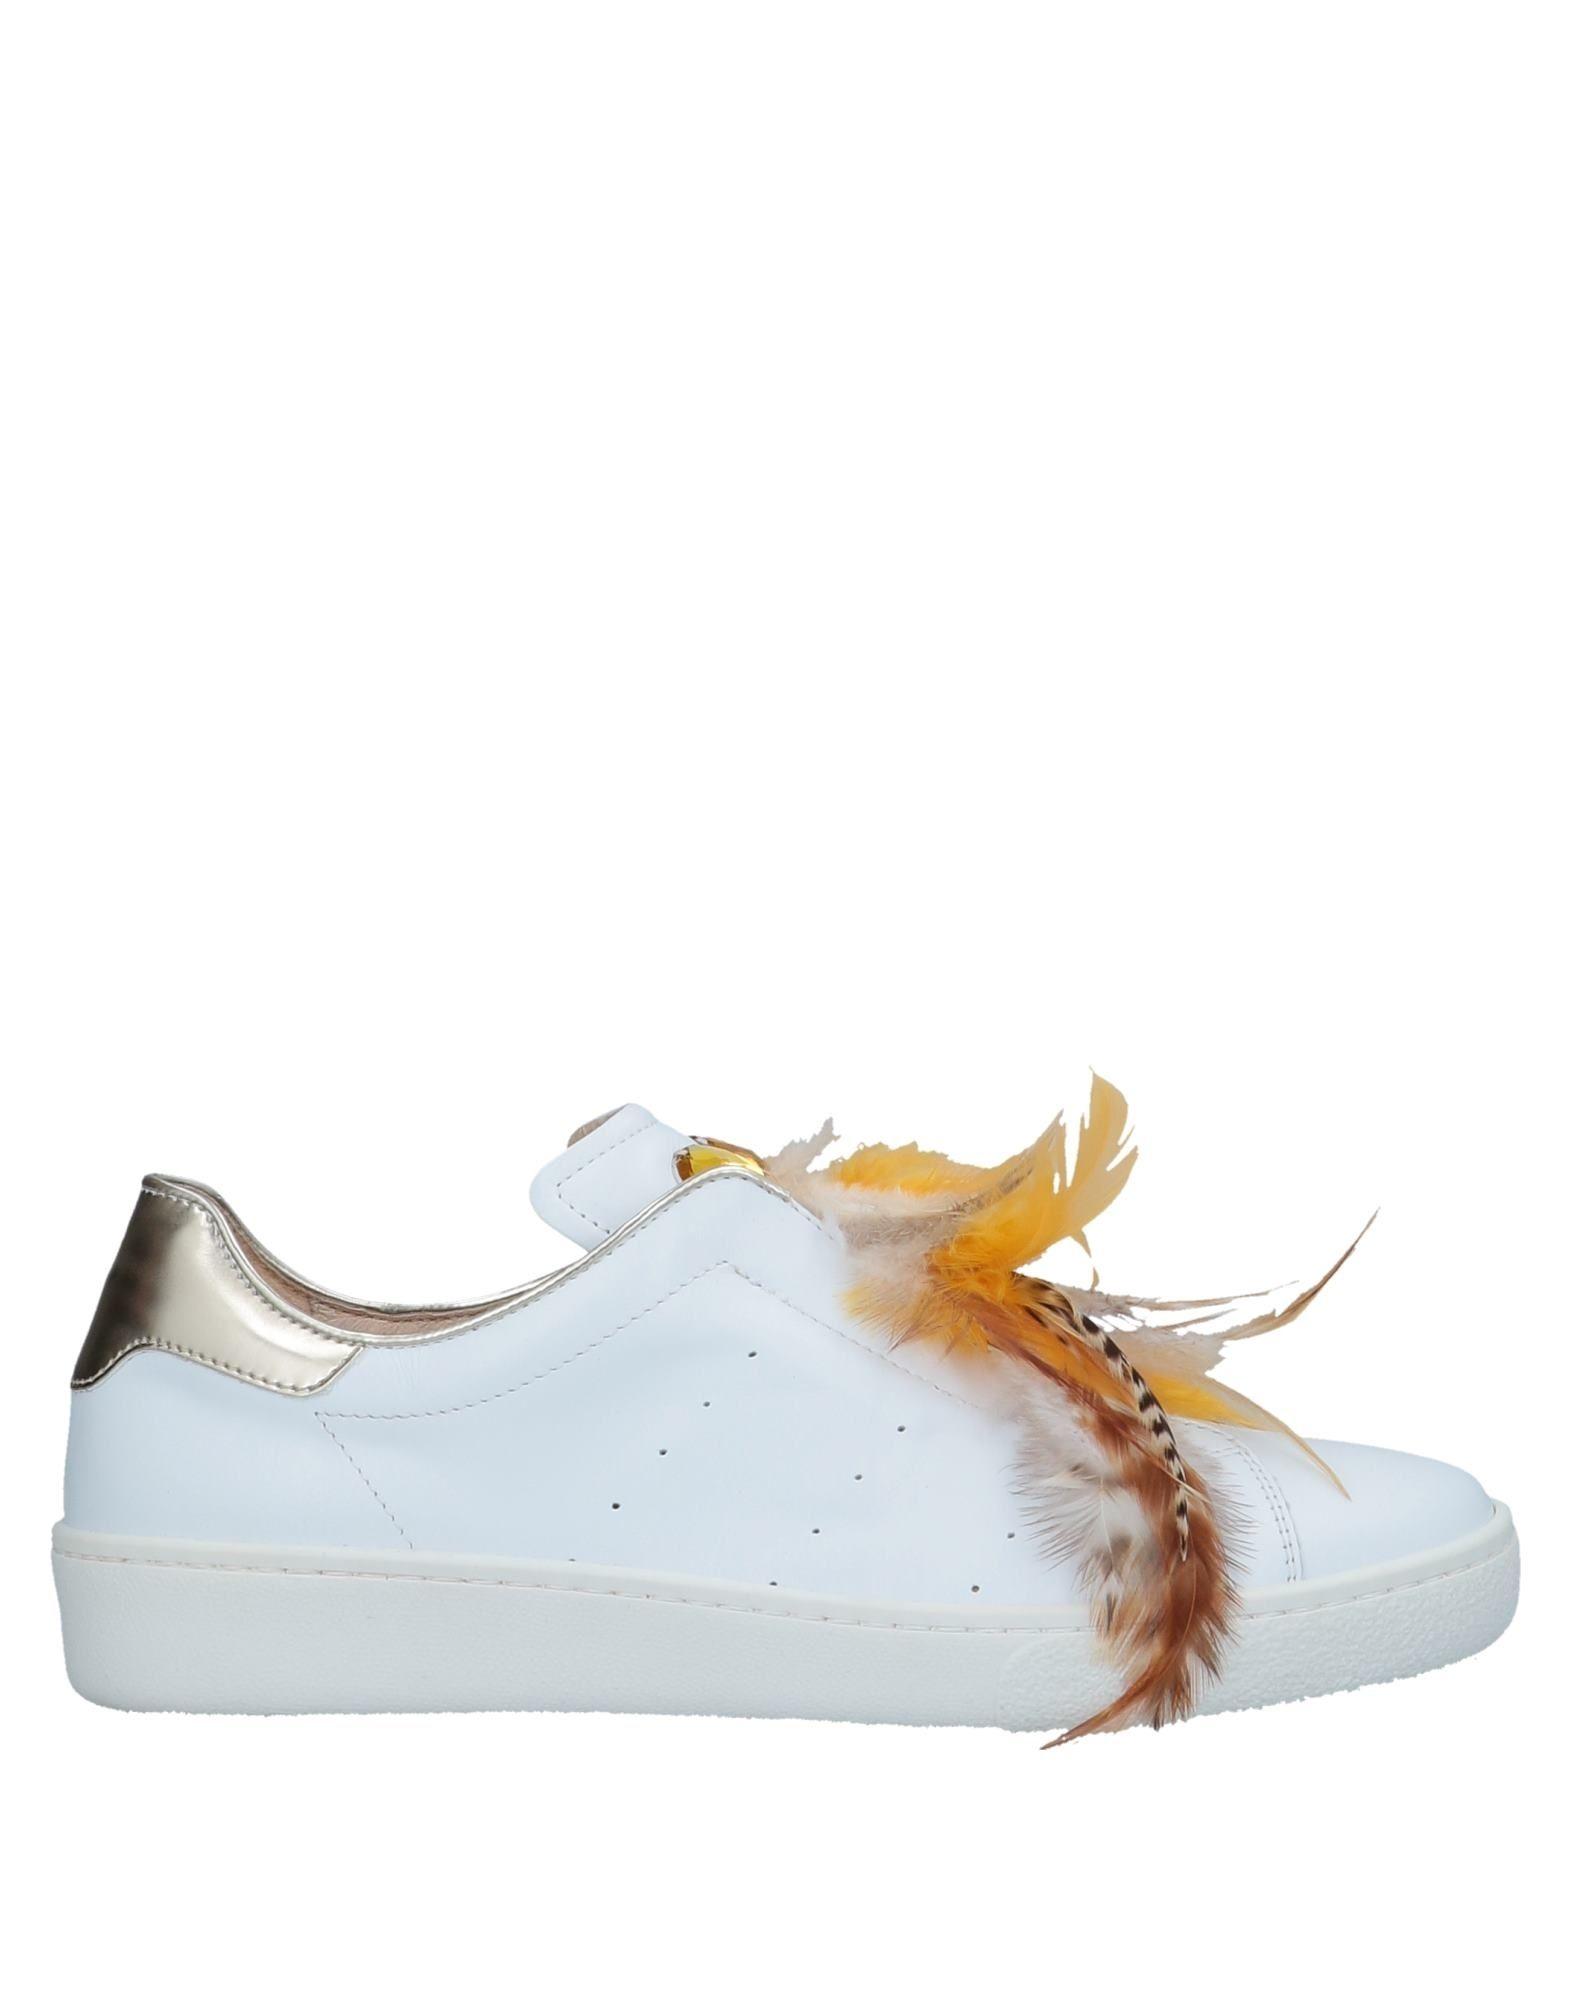 Sneakers Pokemaoke Donna - 11543918RK elegante